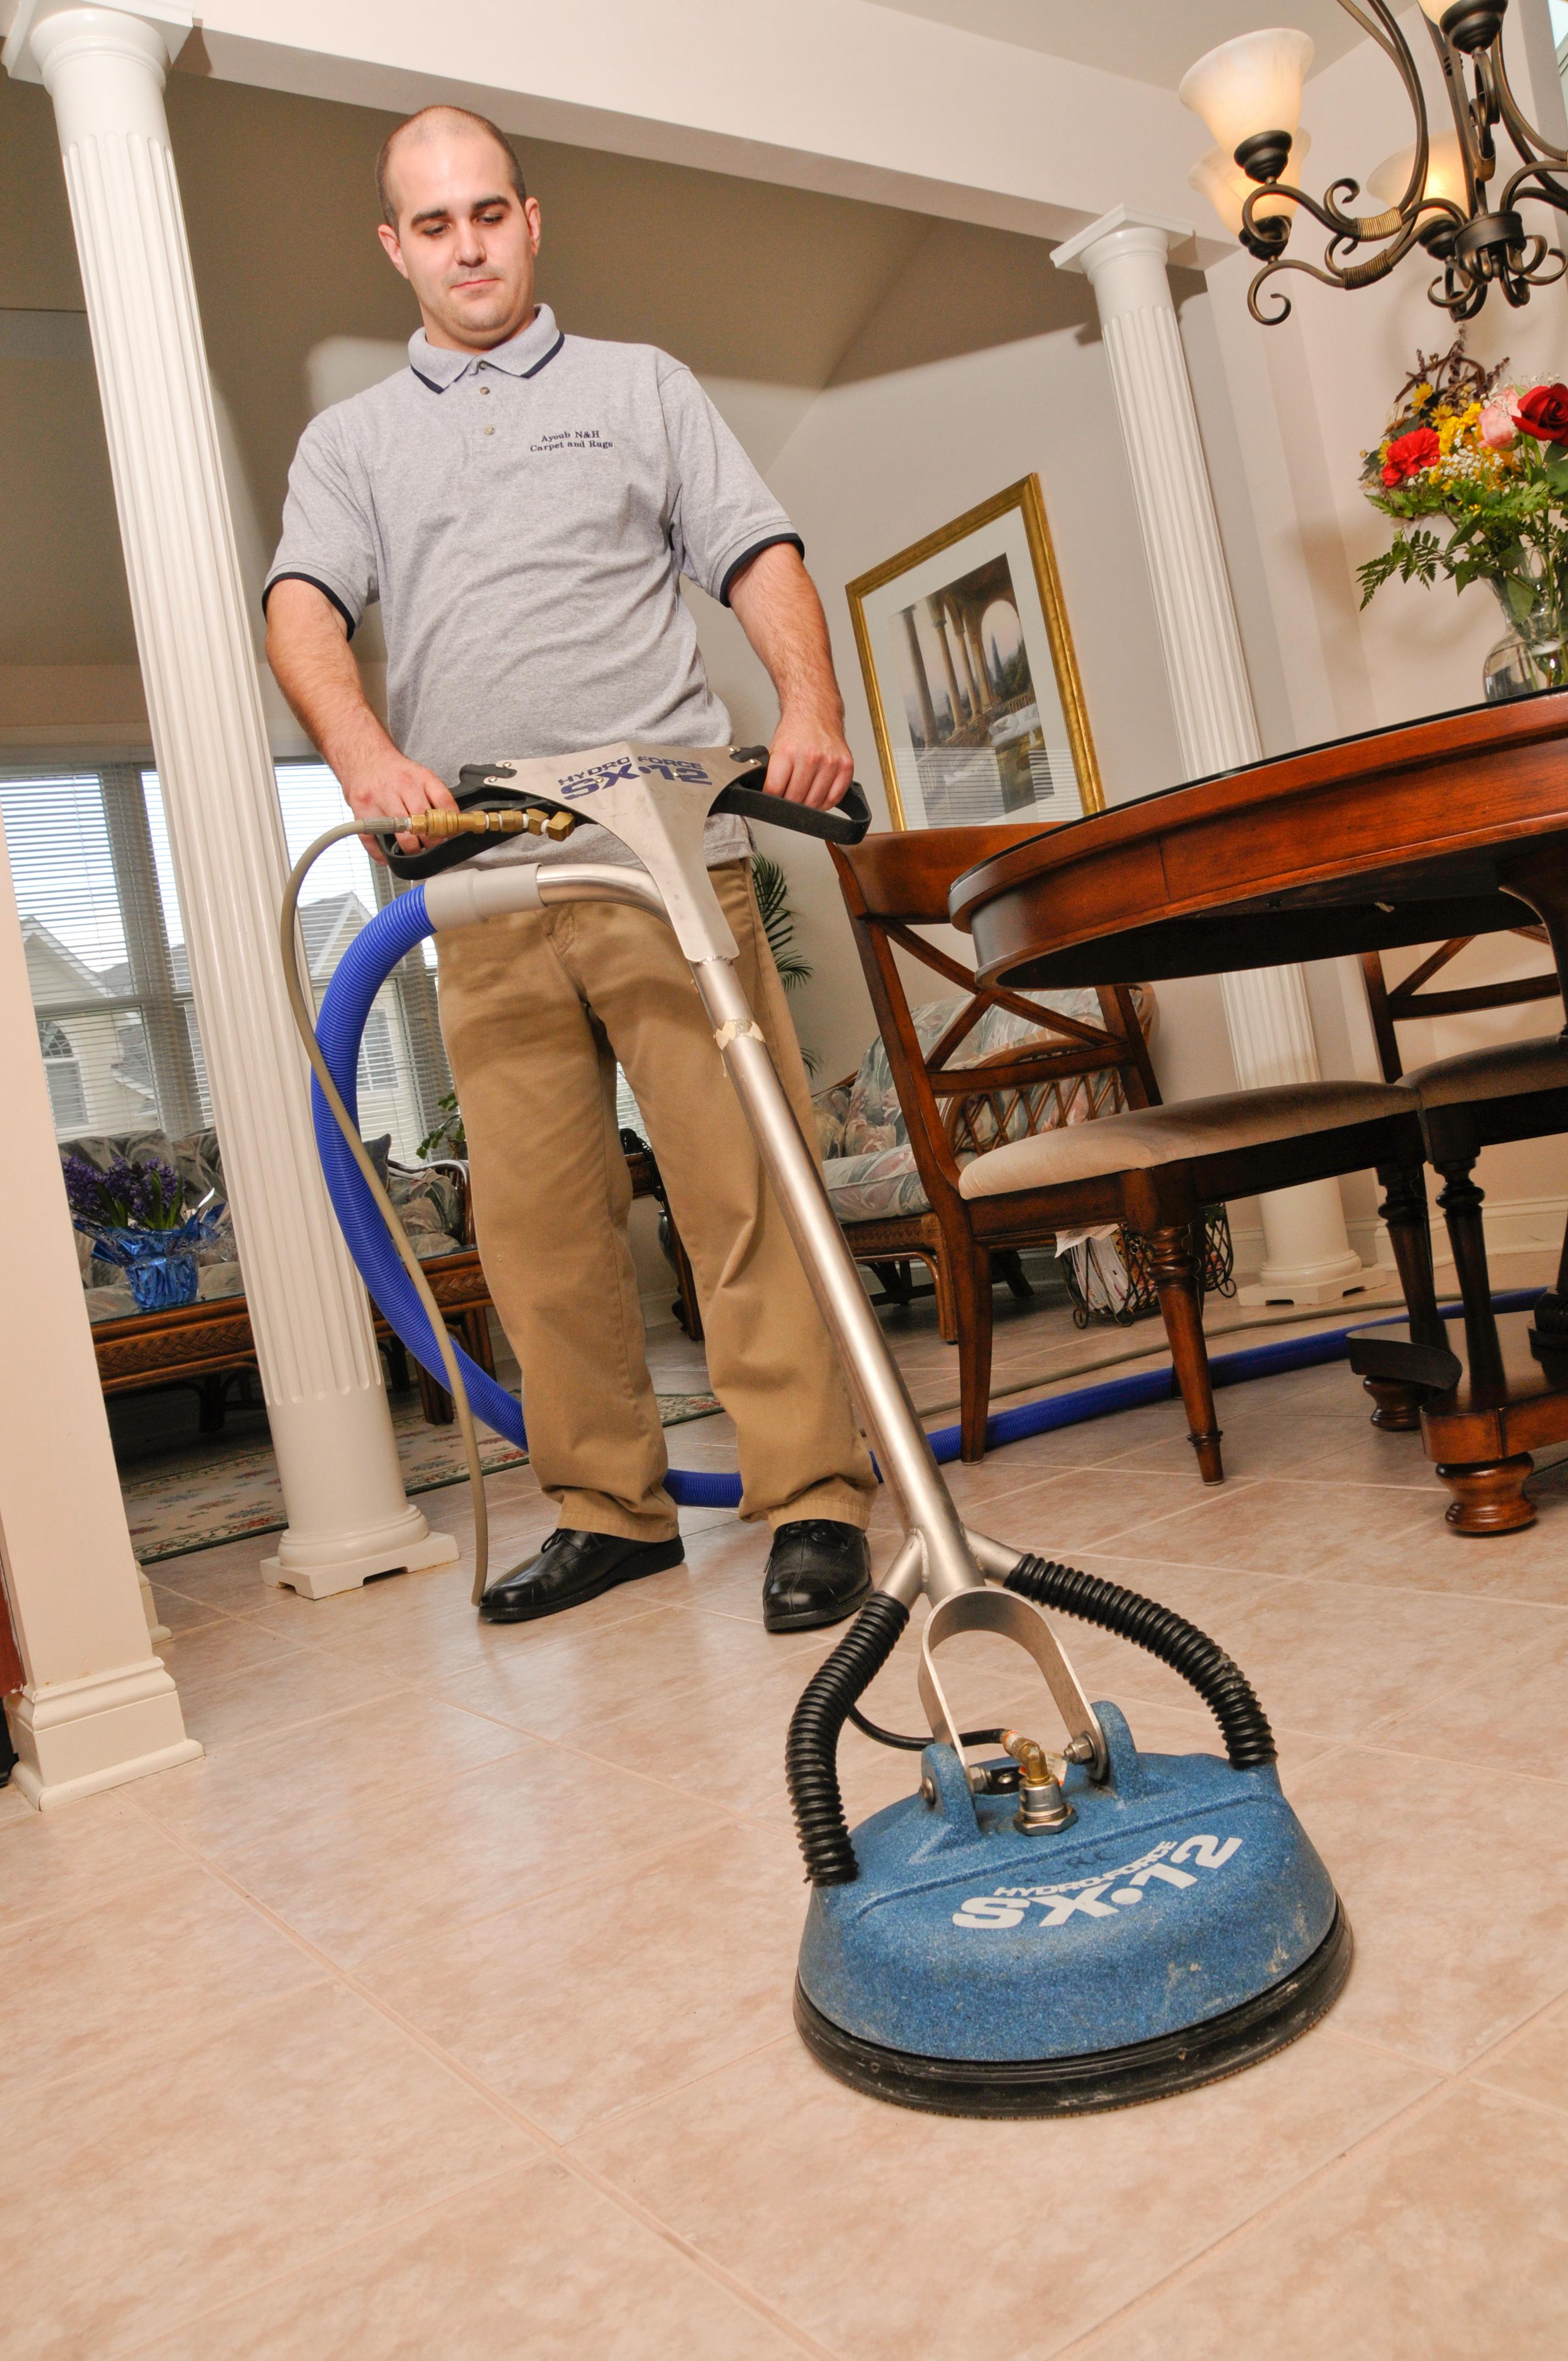 Ayoub N Amp H Carpet Amp Rugs Kensington Md 20895 Angies List